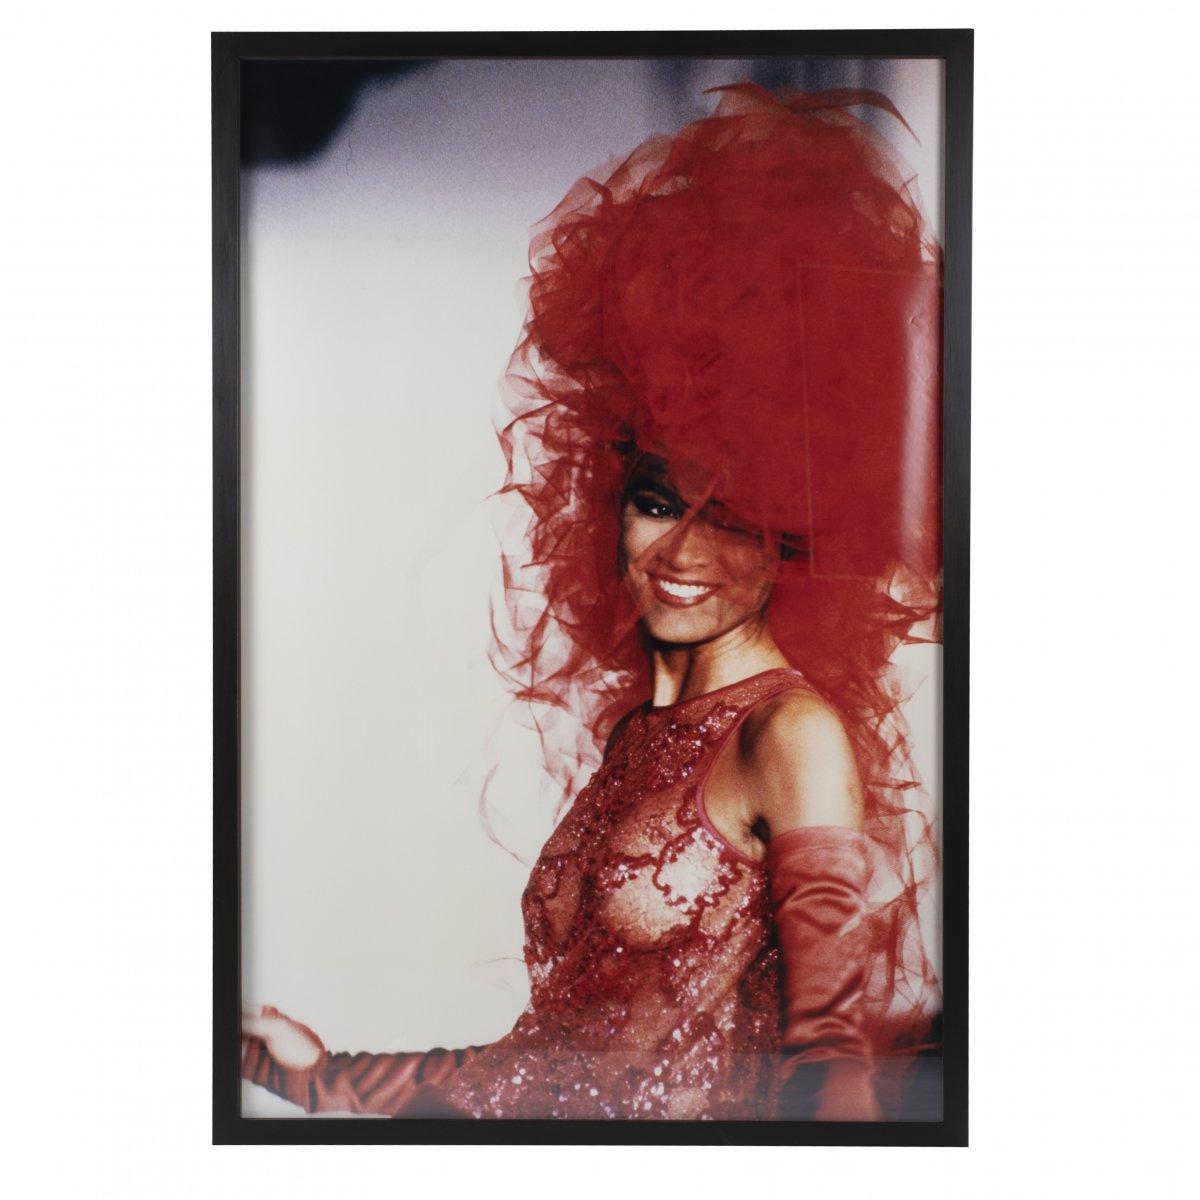 Grande photographie de mode de la marque de mode avant-garde Tonga, Munich 1980